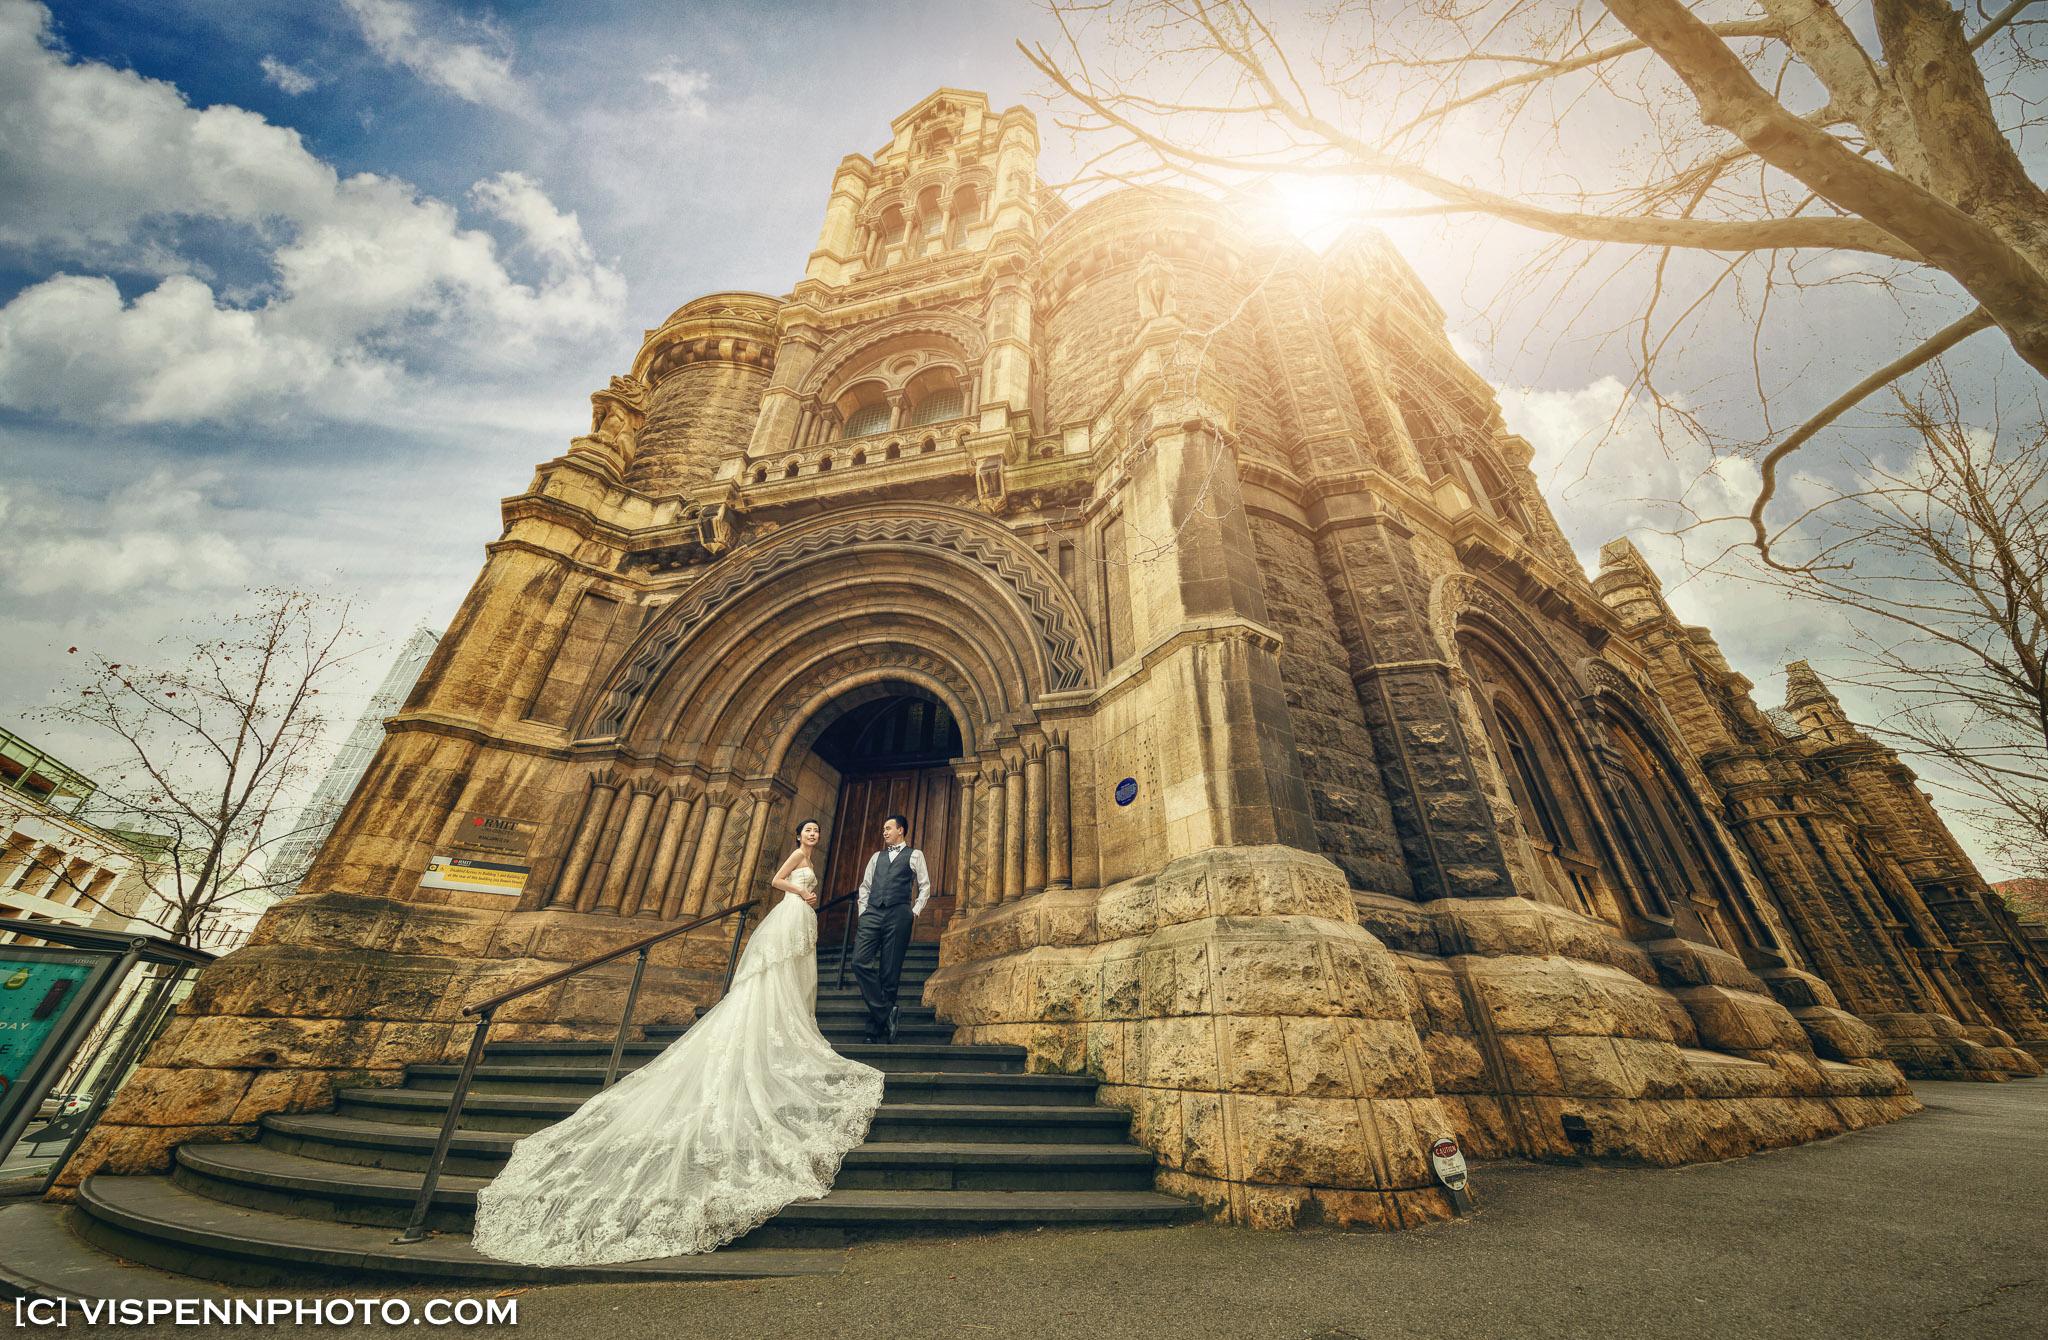 PRE WEDDING Photography Melbourne VISPENN 墨尔本 婚纱照 结婚照 婚纱摄影 VISPENN XXD 3520 1